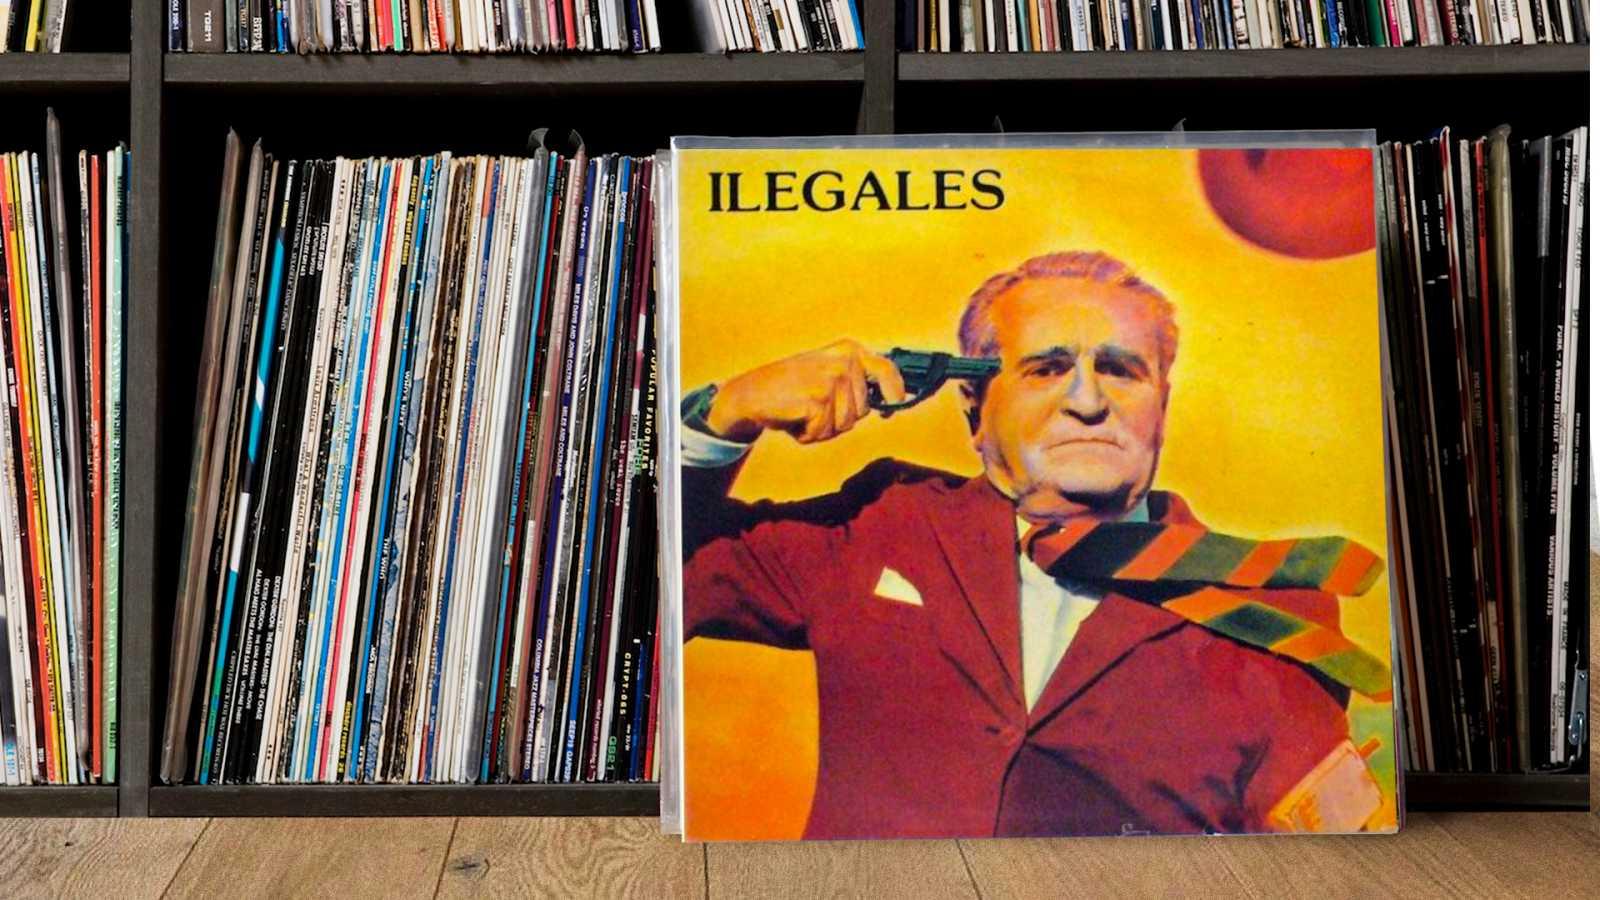 Doce Pulgadas - Recuerdos Ilegales - 15/10/20 - escuchar ahora